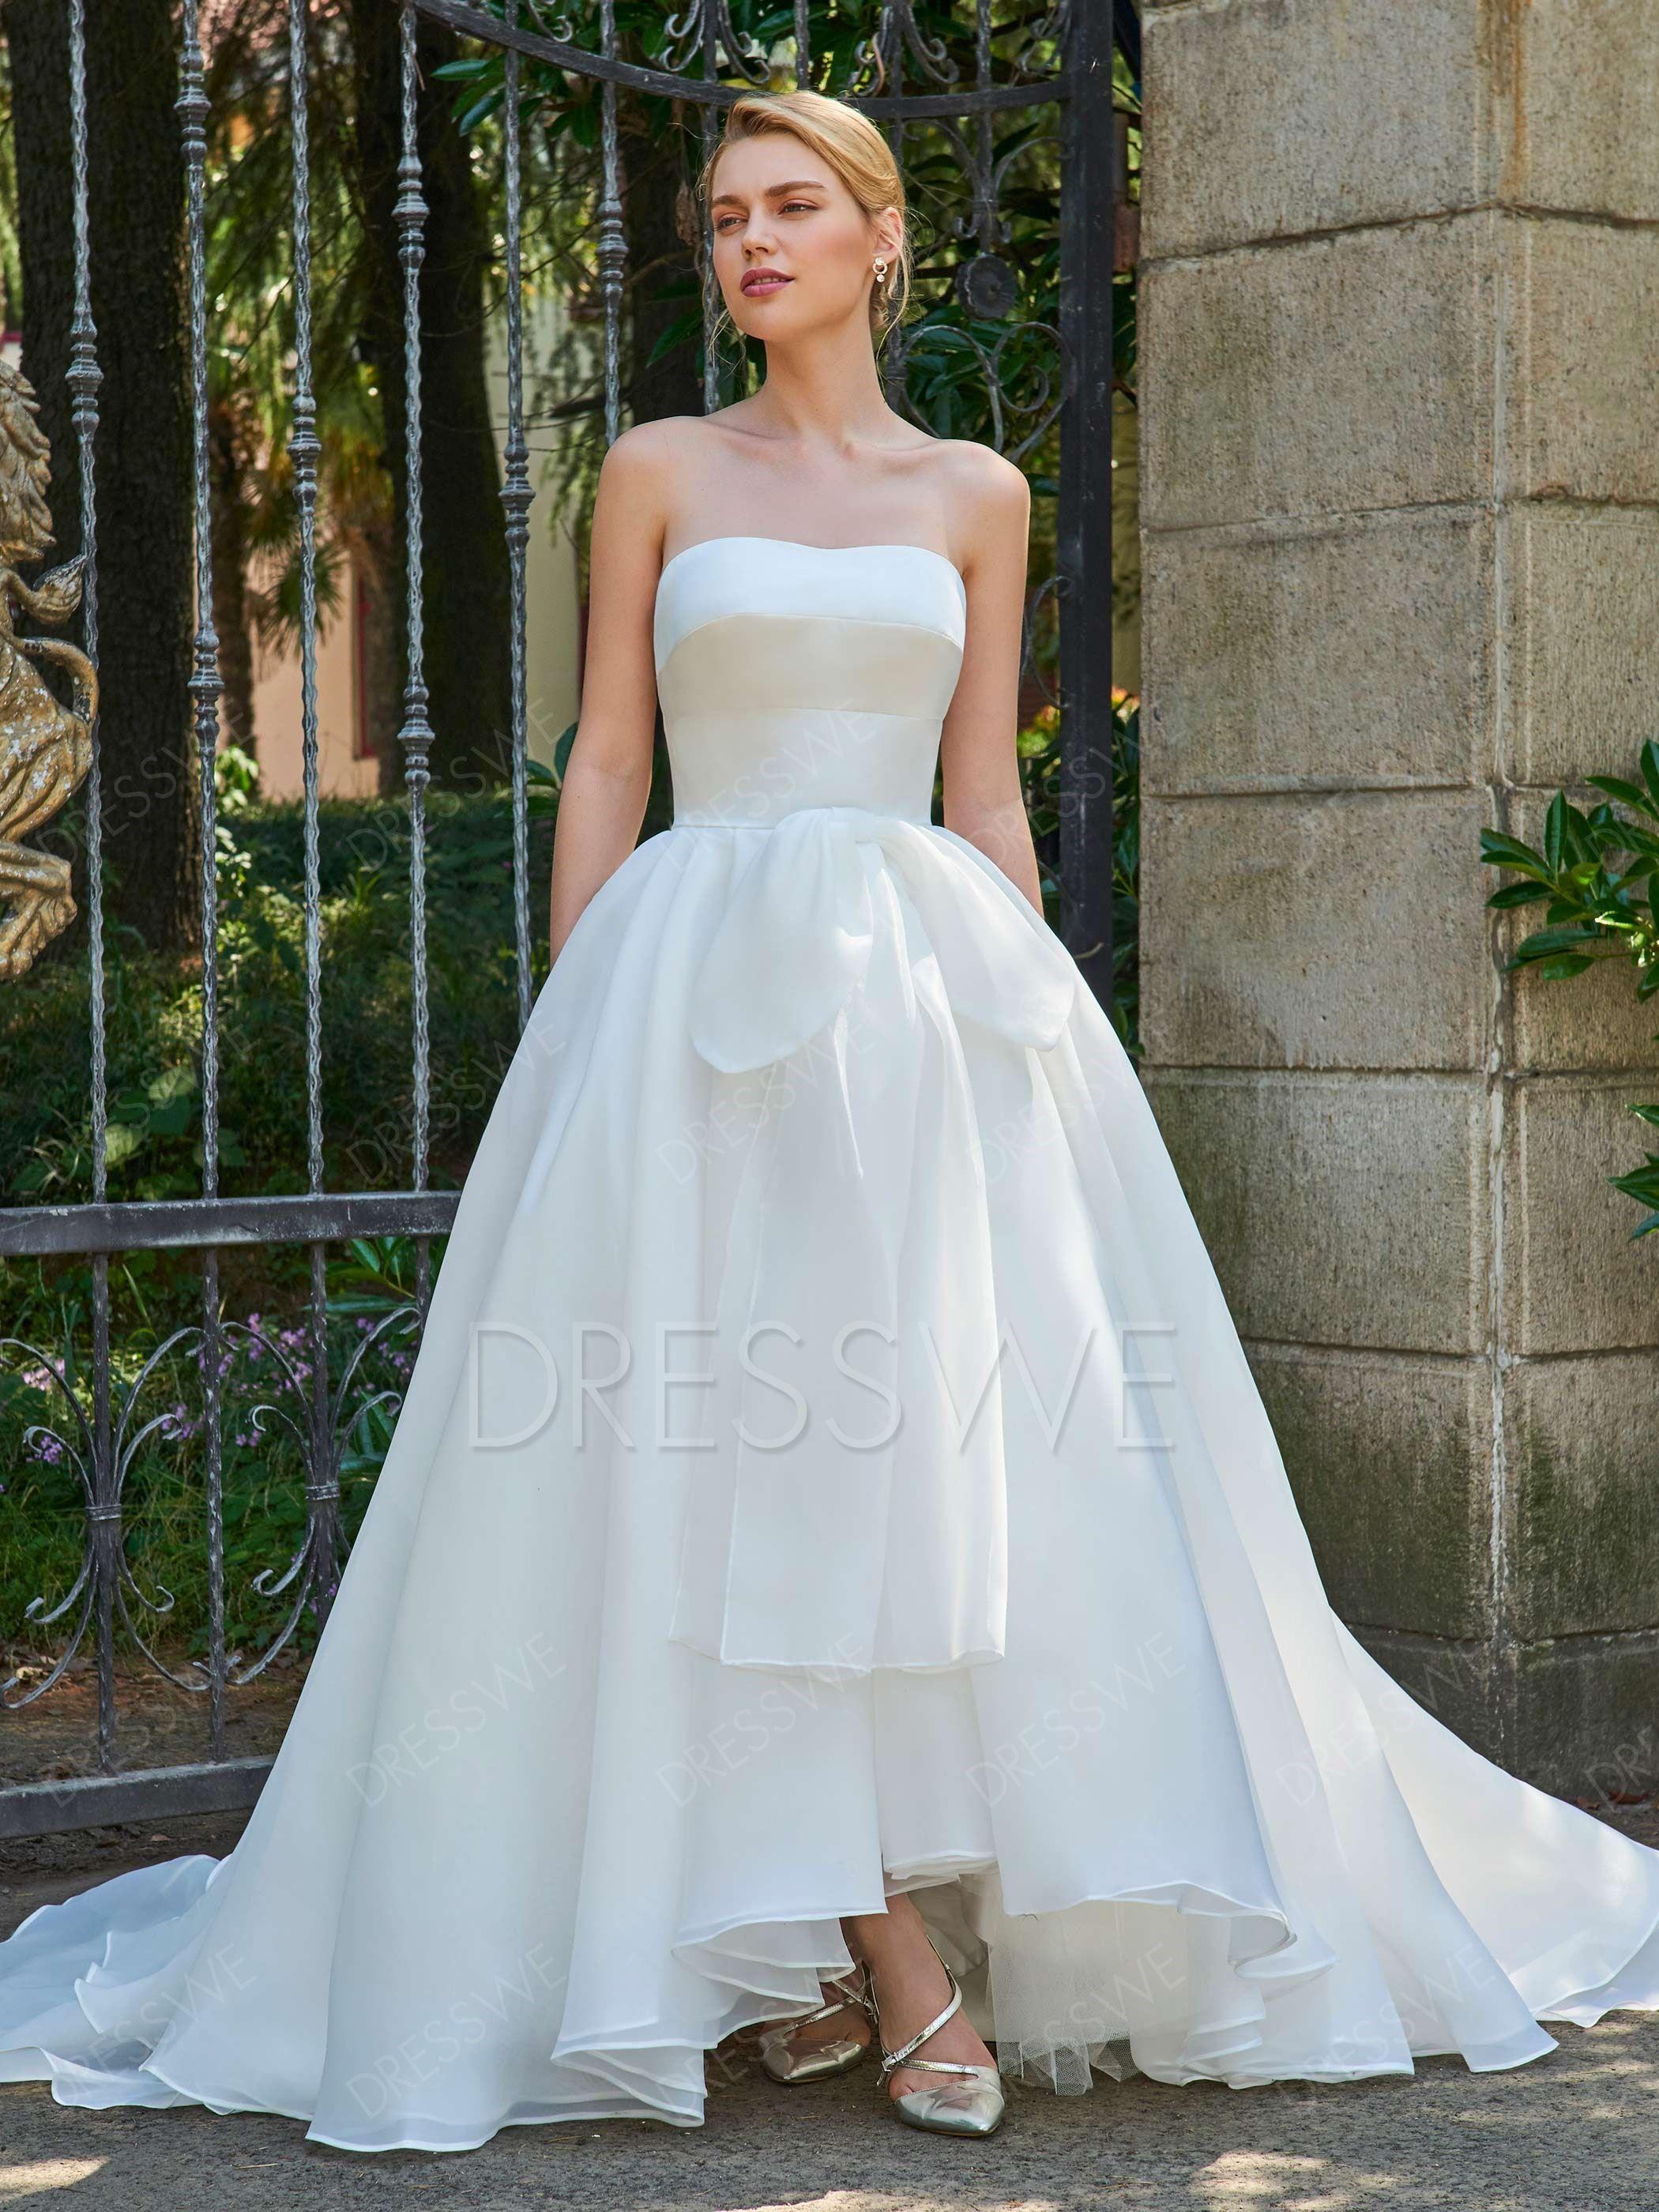 Amazing Buying A Wedding Dress Online Embellishment - All Wedding ...